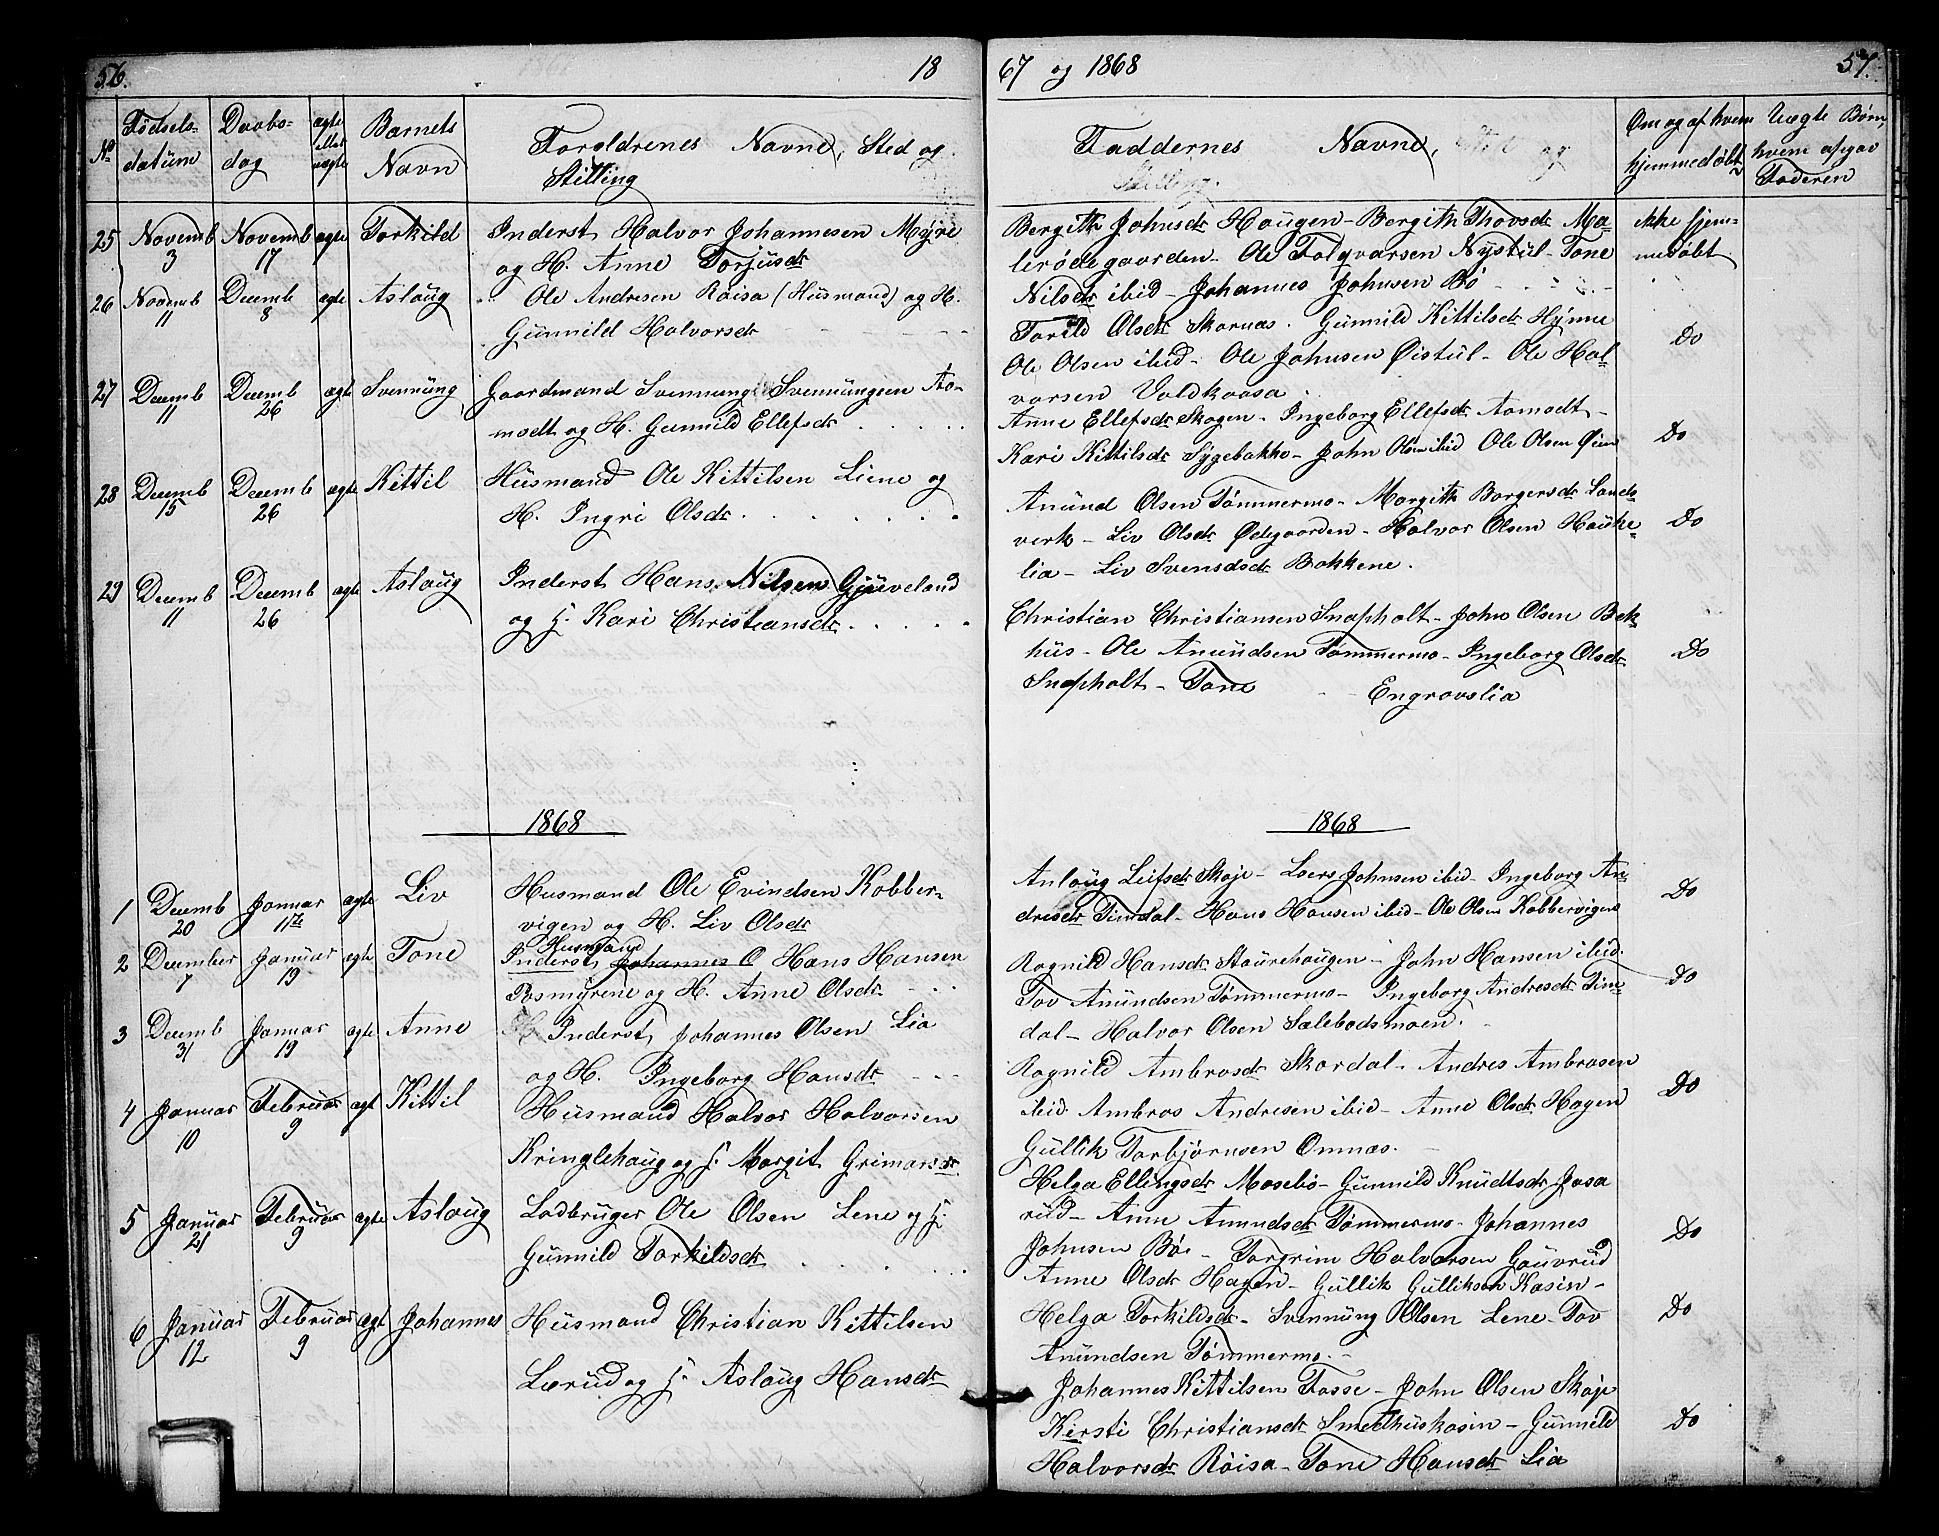 SAKO, Hjartdal kirkebøker, G/Gb/L0002: Klokkerbok nr. II 2, 1854-1884, s. 56-57